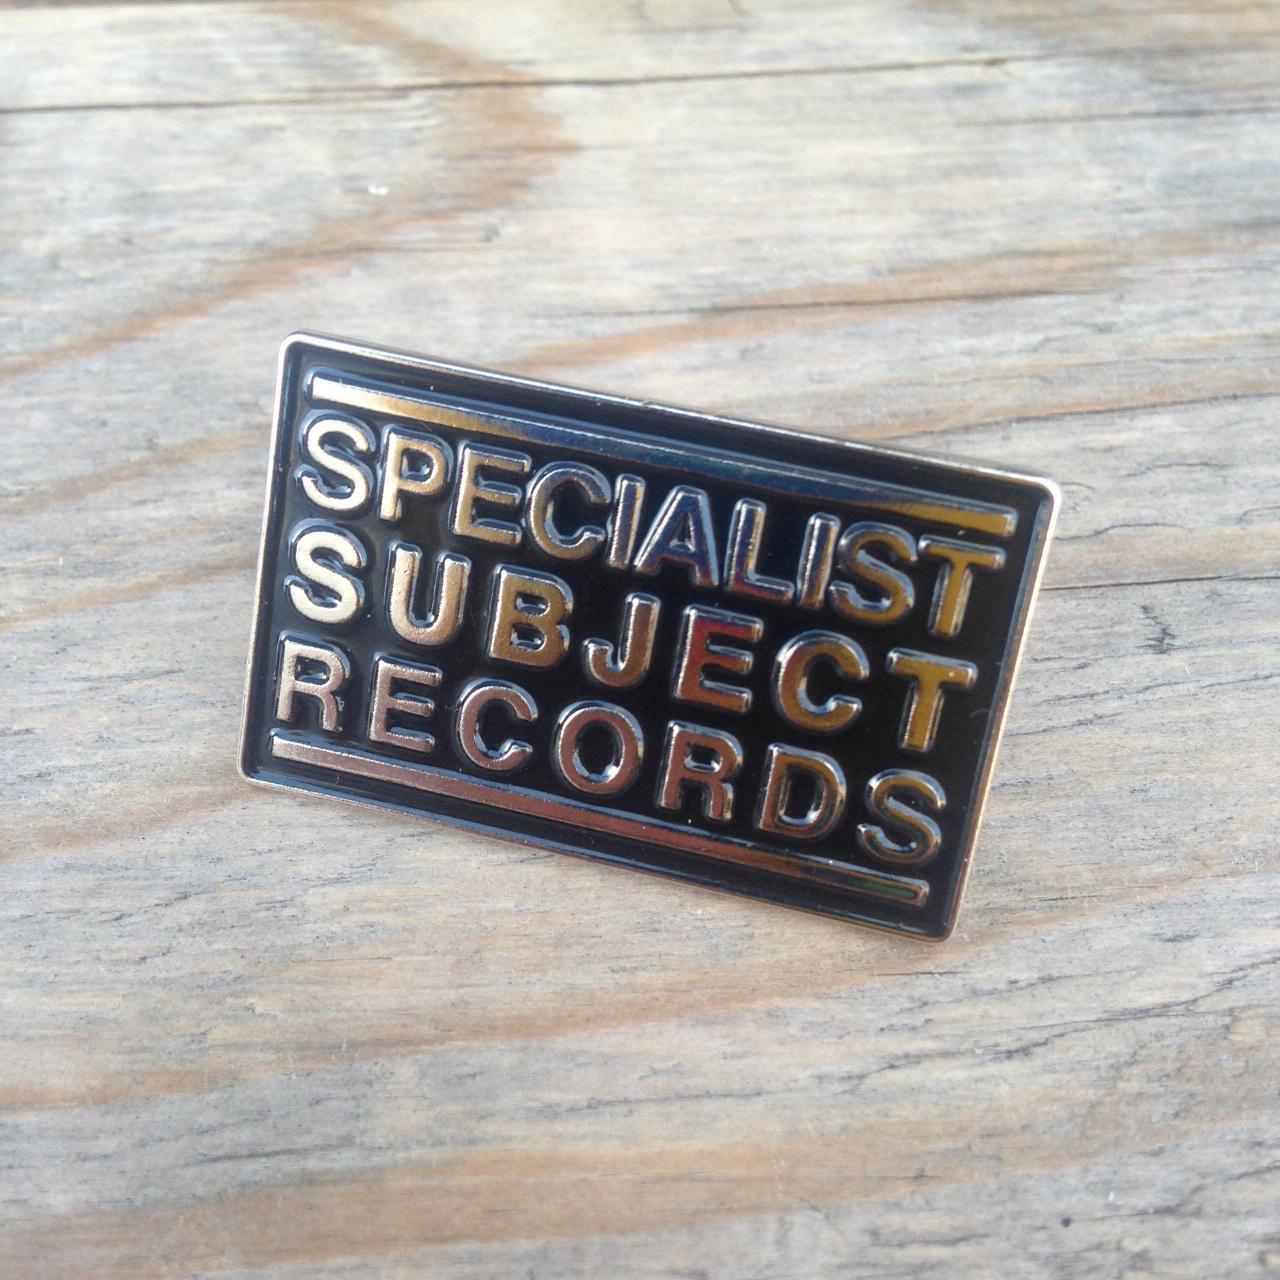 Big Specialist Subject Logo enamel pin badge